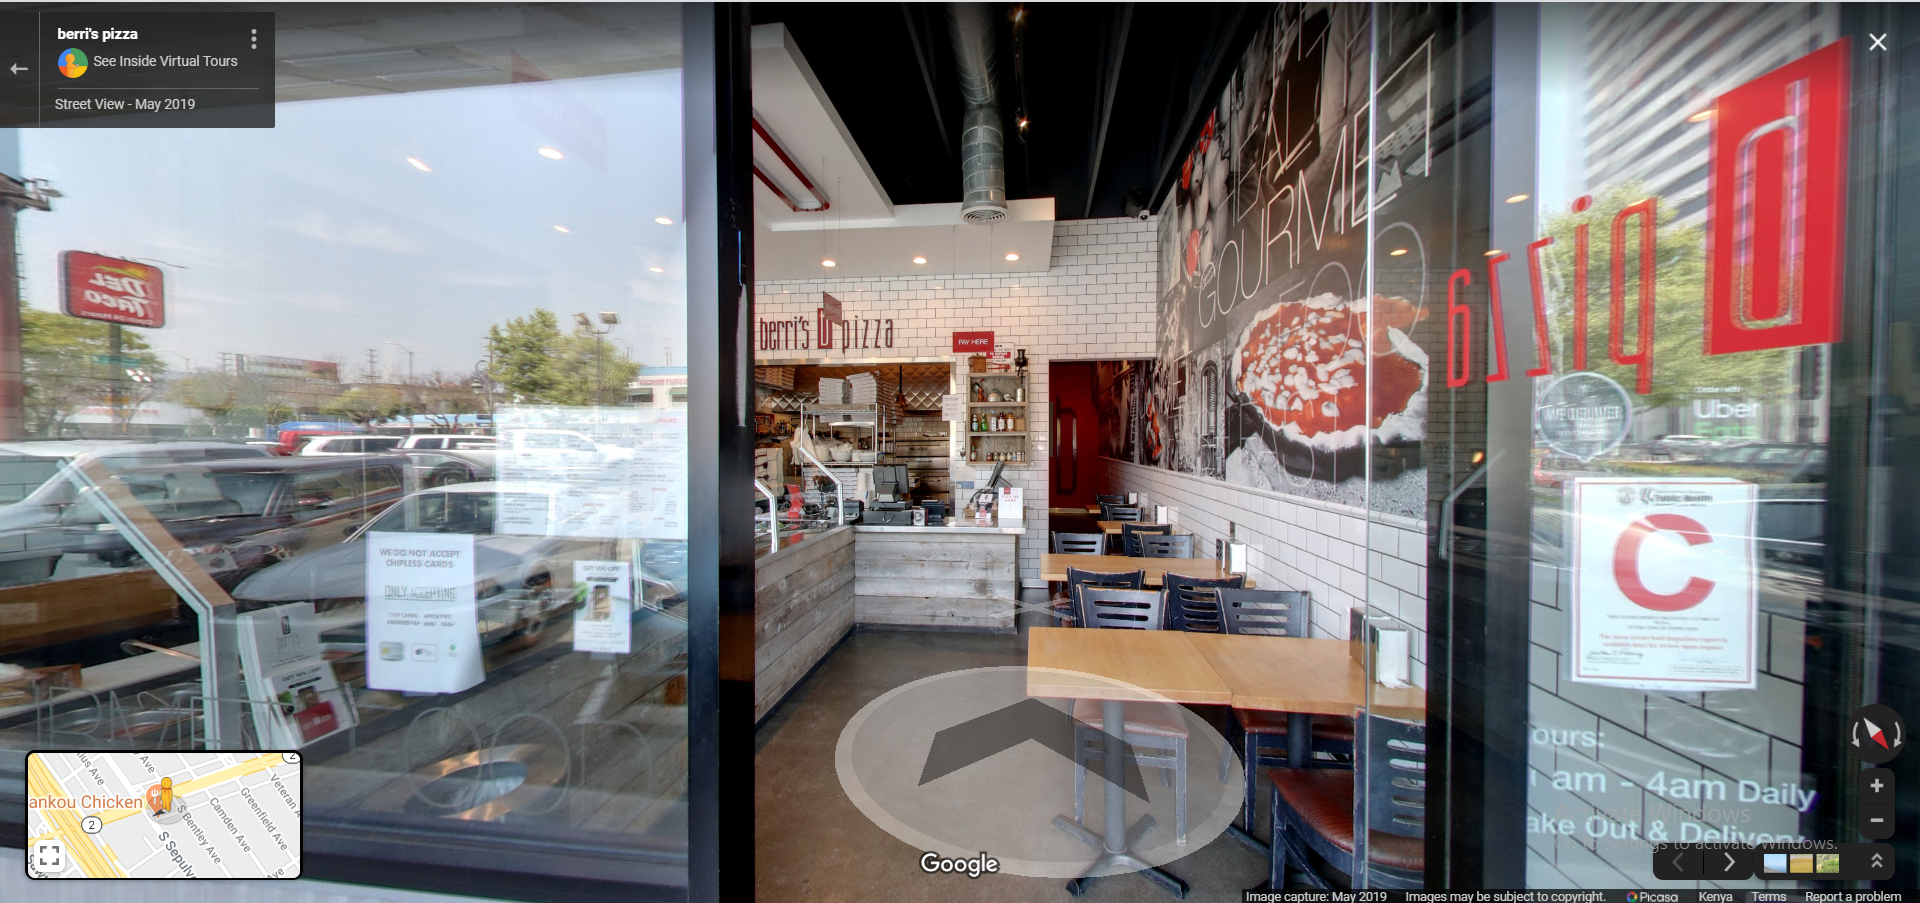 berri's pizza (Santa Monica Blvd.) - Los Angeles